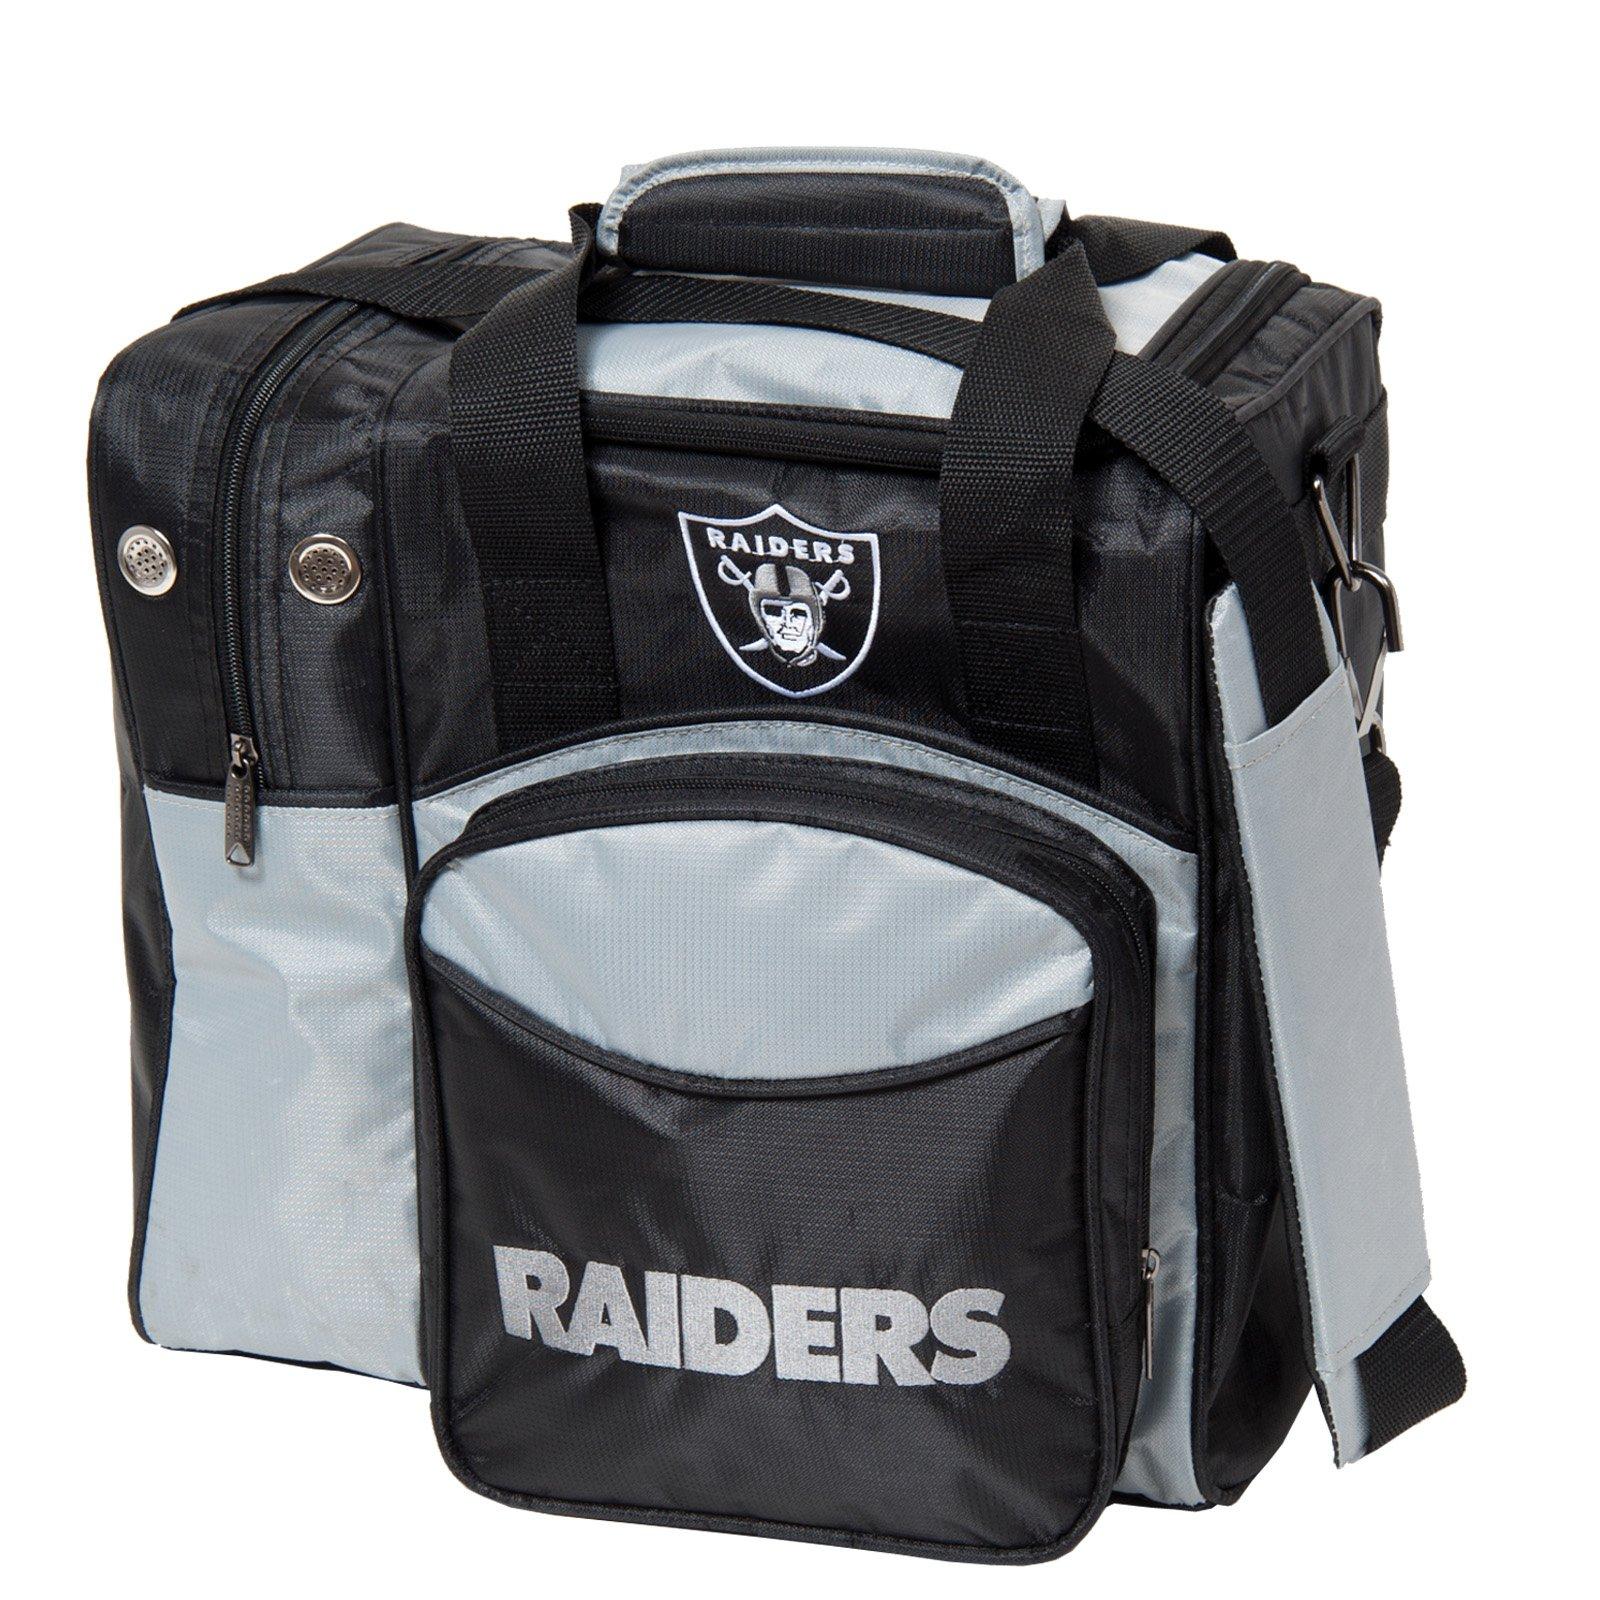 NFL Single Bag Oakland Raiders Bowling Ball Tote by Strikeforce Bowling